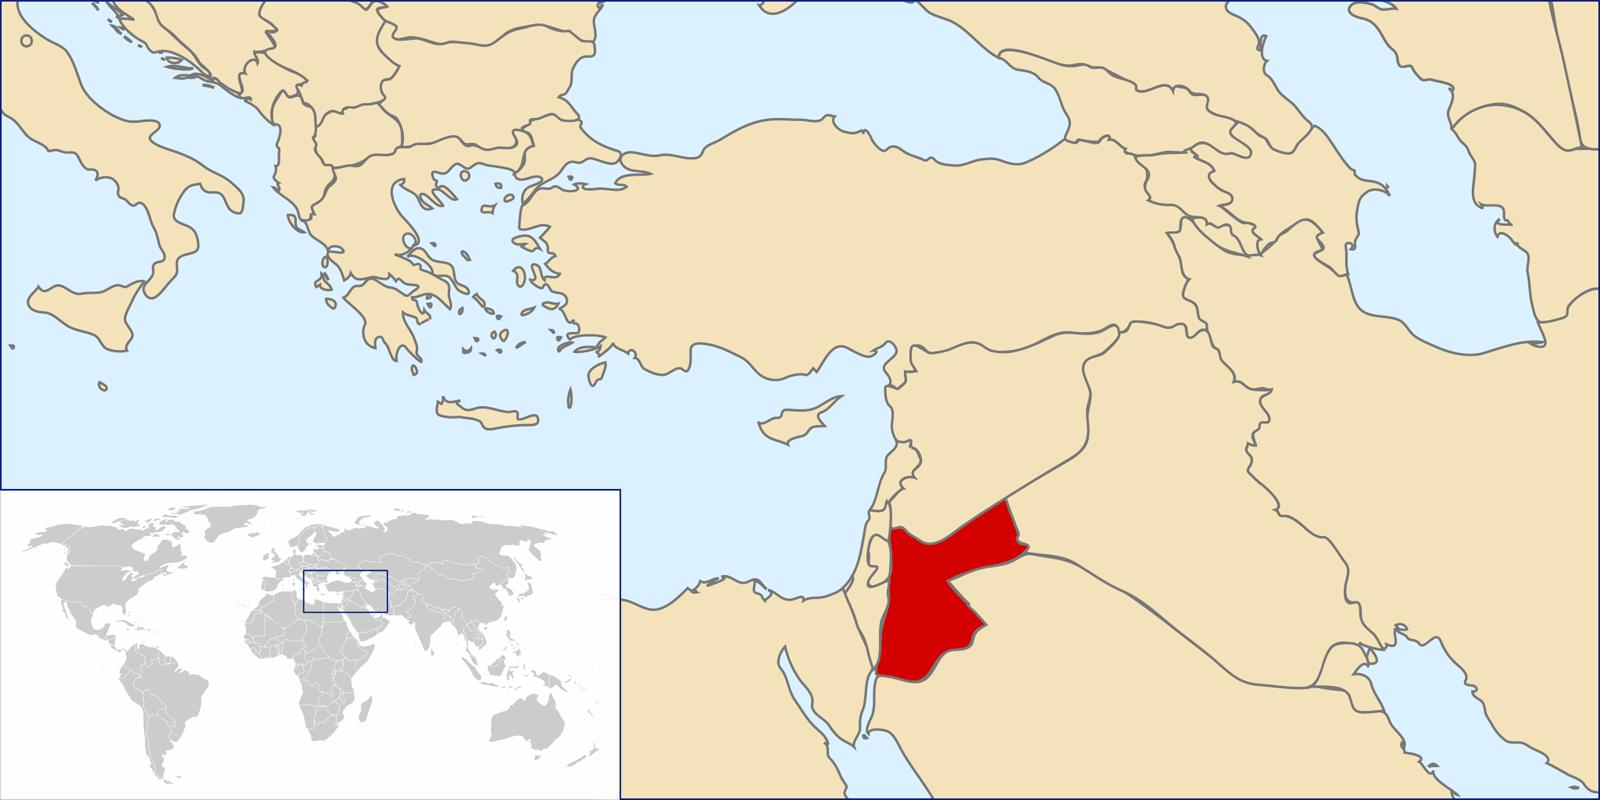 Jordan world map - Jordan in the world map (Western Asia - Asia)